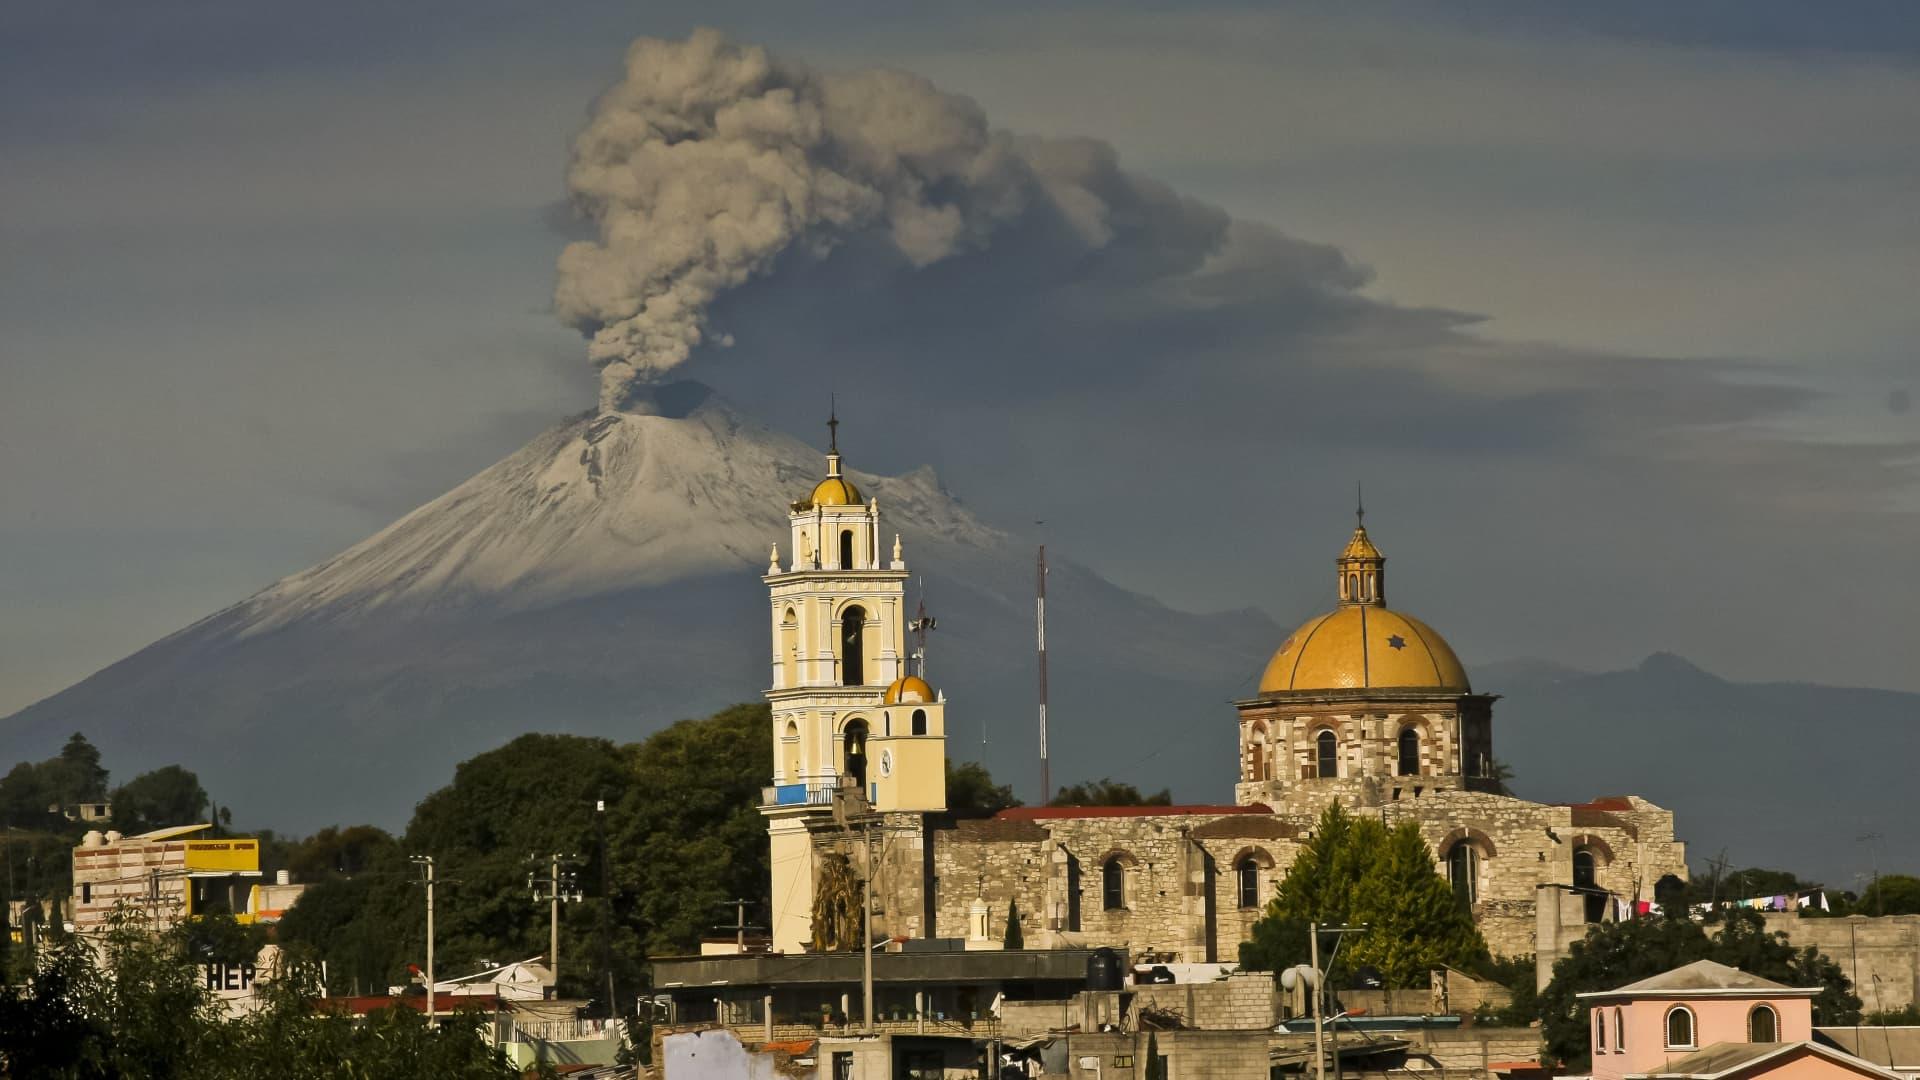 Ash spews from Mexico's Popocatepetl volcano on July 9, 2013.